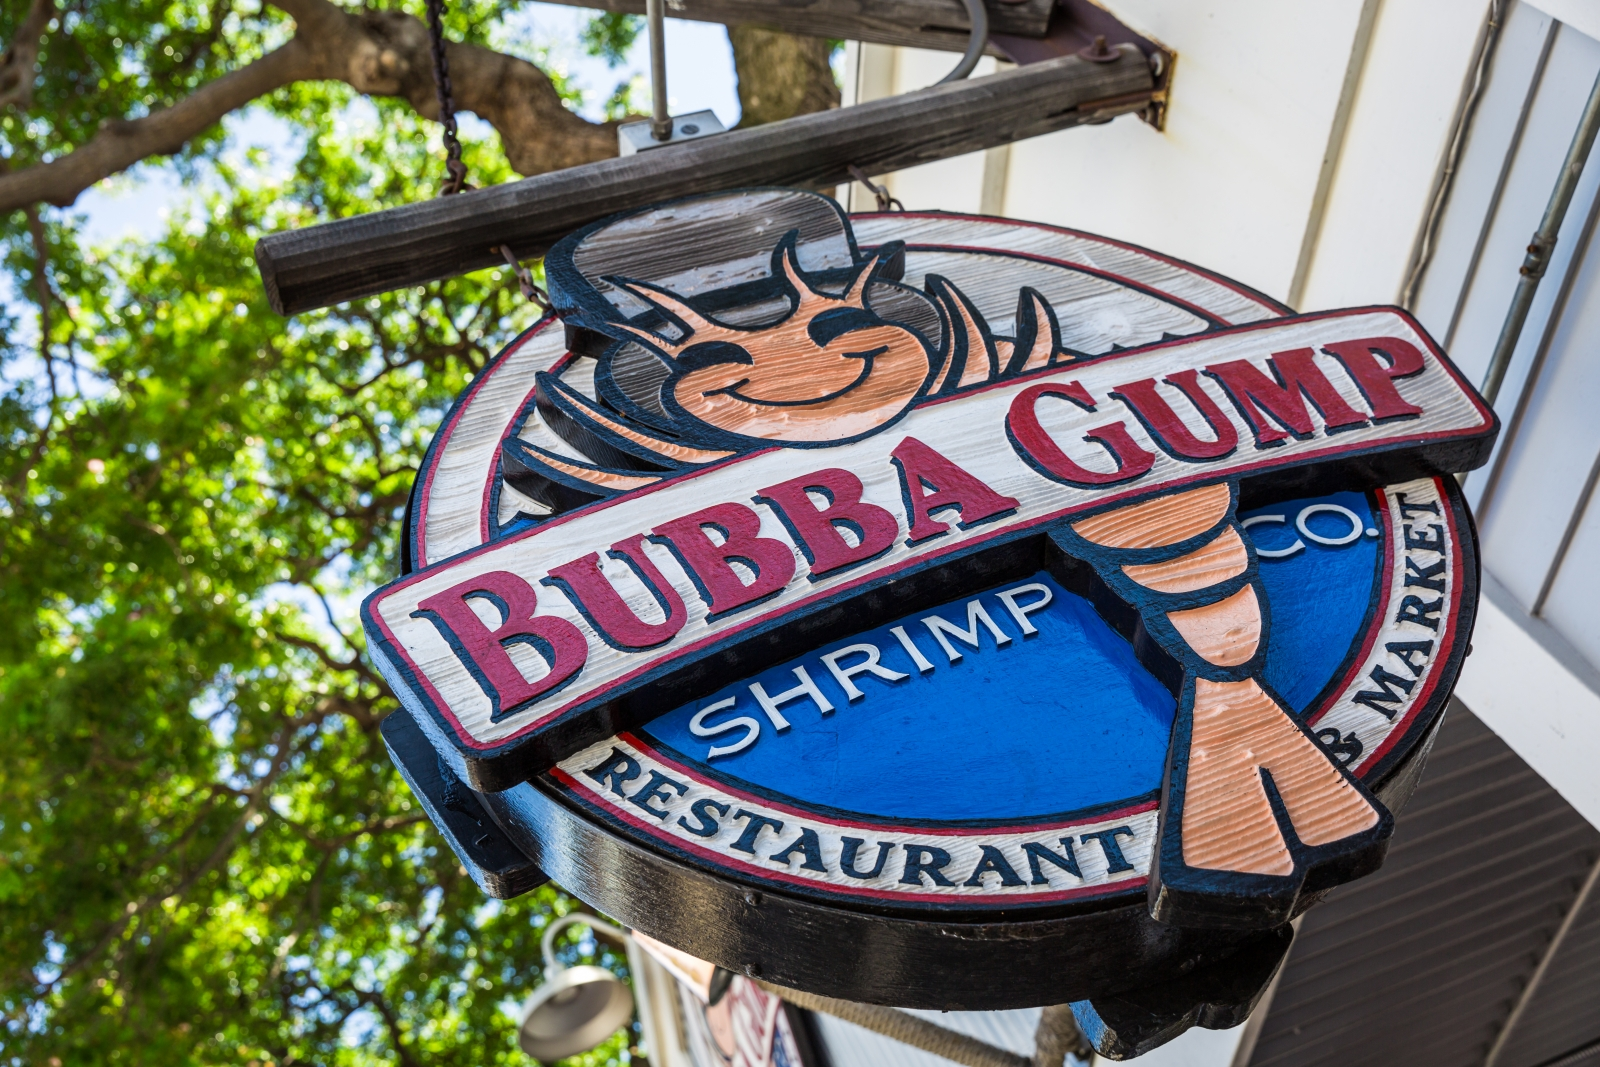 Bubba Gump Shrimp Co sign